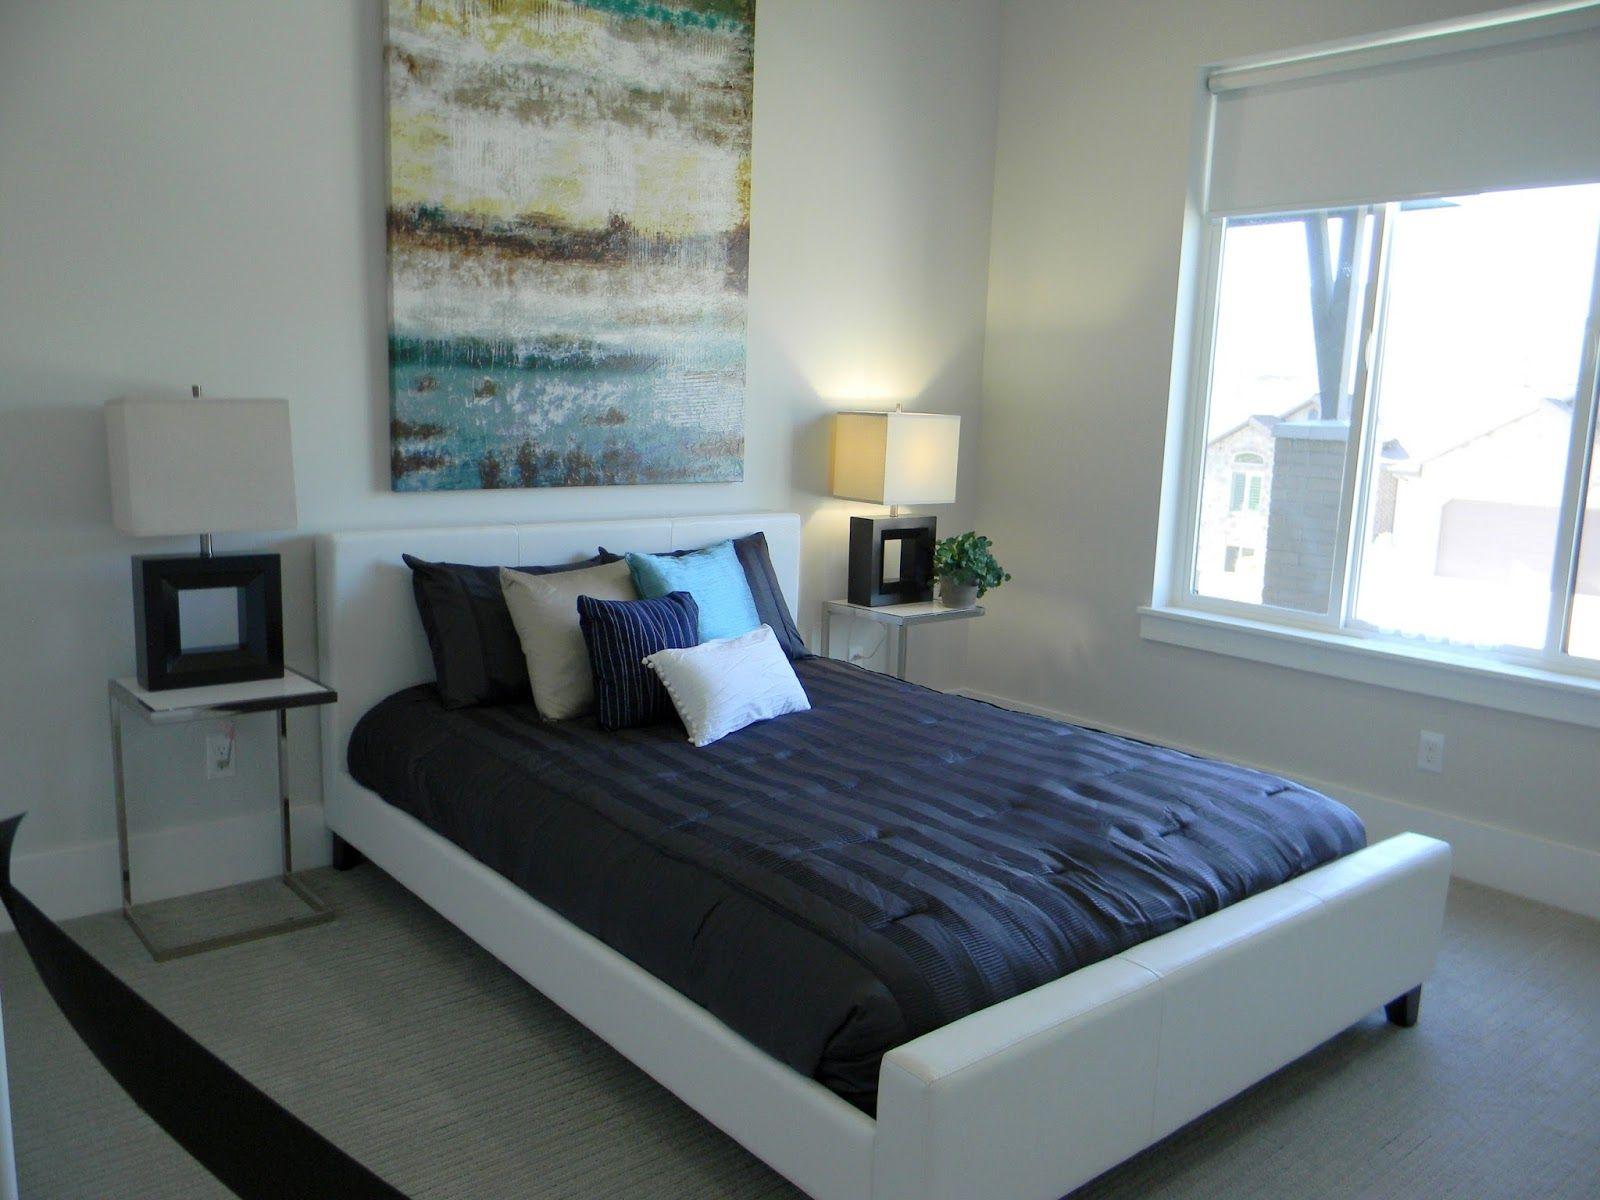 Bedroom Paints Design Unique Lime Green Accent Wall Bedroom  Bedroom Design  Pinterest Review